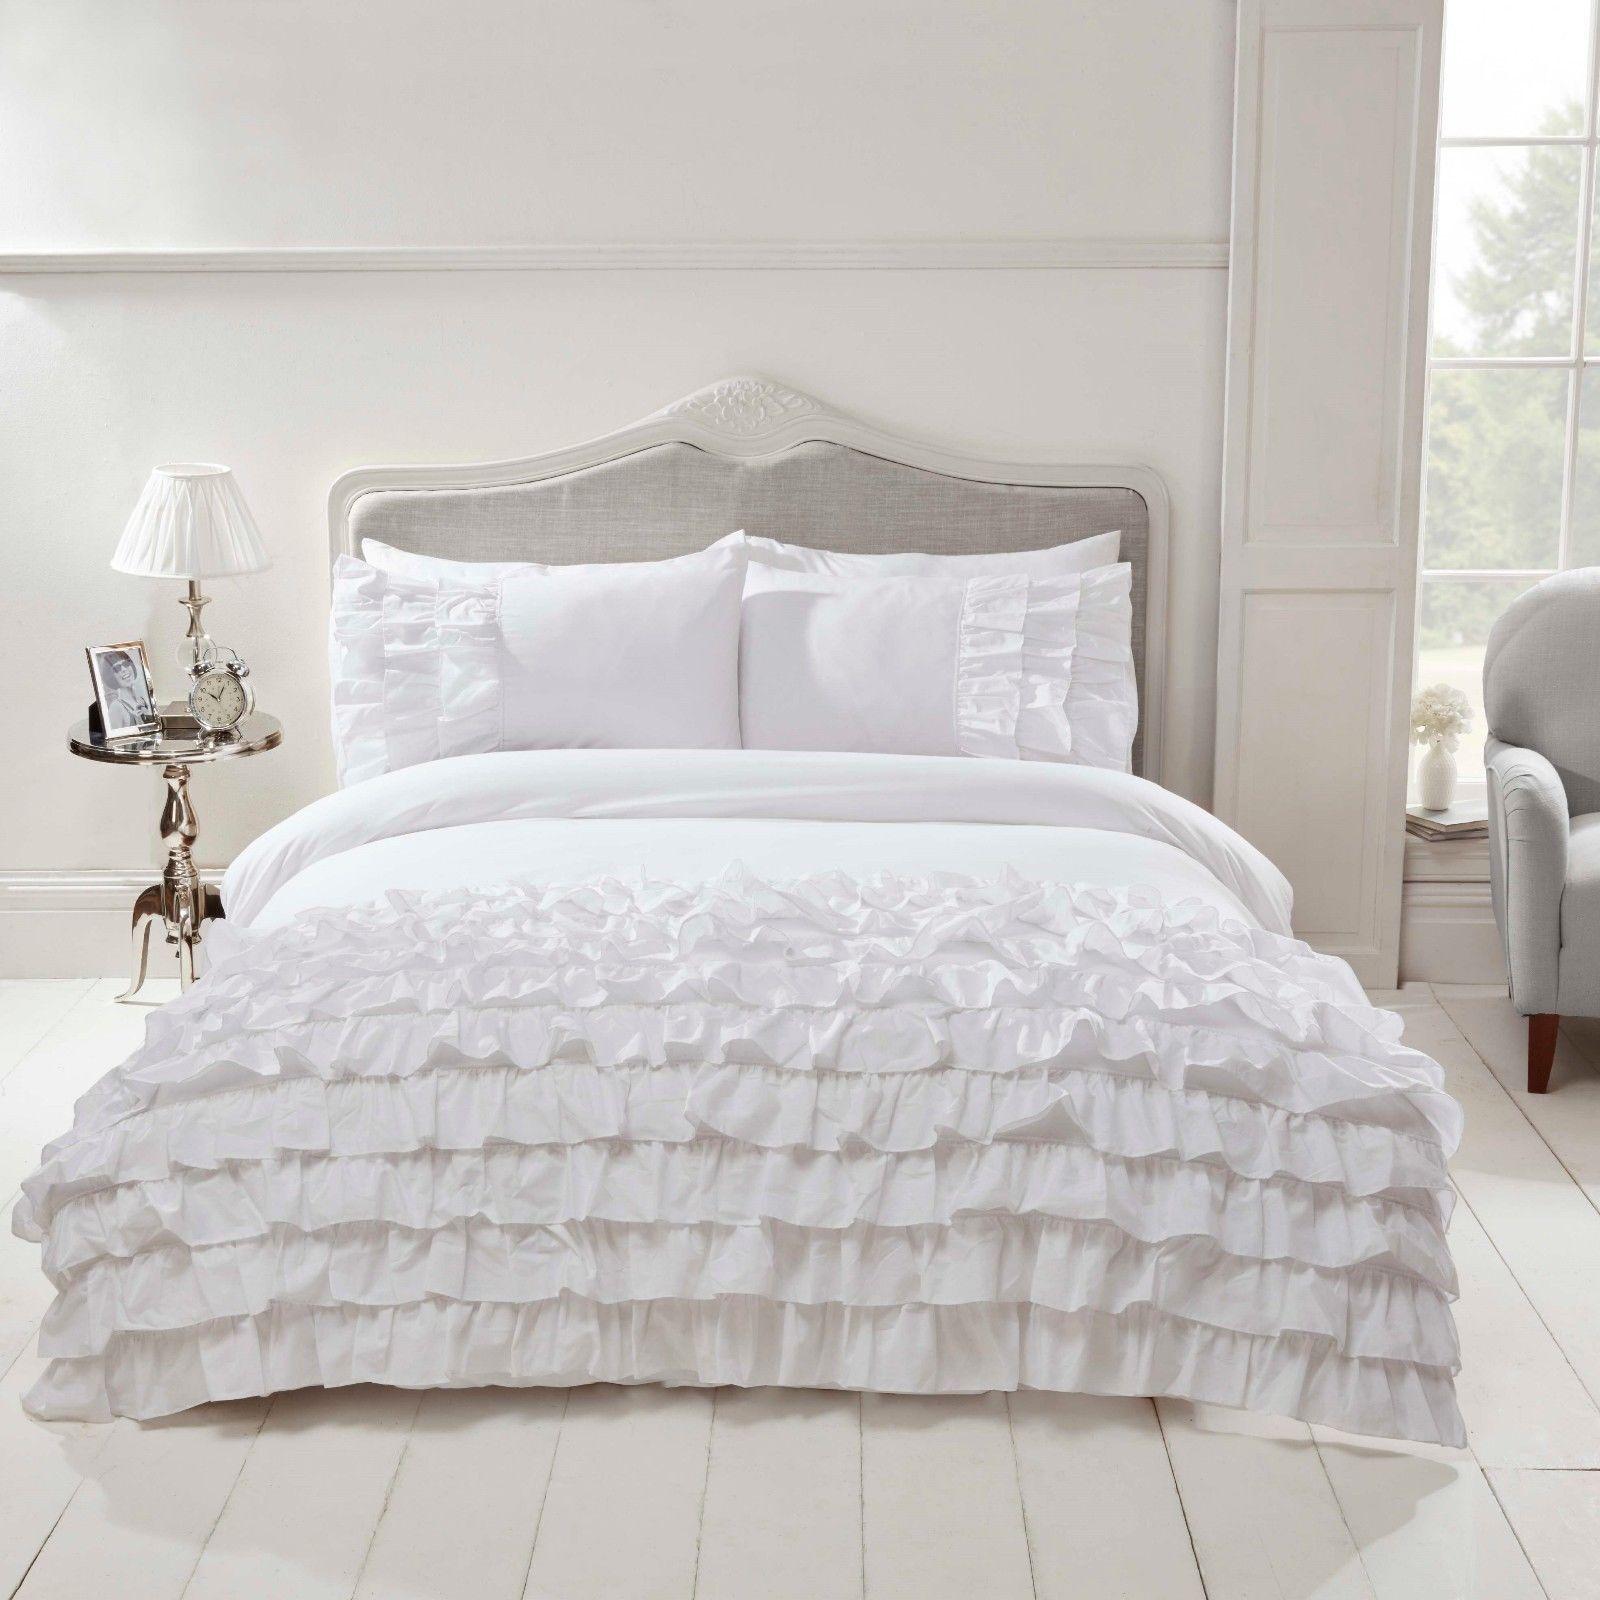 Rapport Flamenco White Quilt Cover Luxury Frills Ruffles Bedding Set  FREE P&P